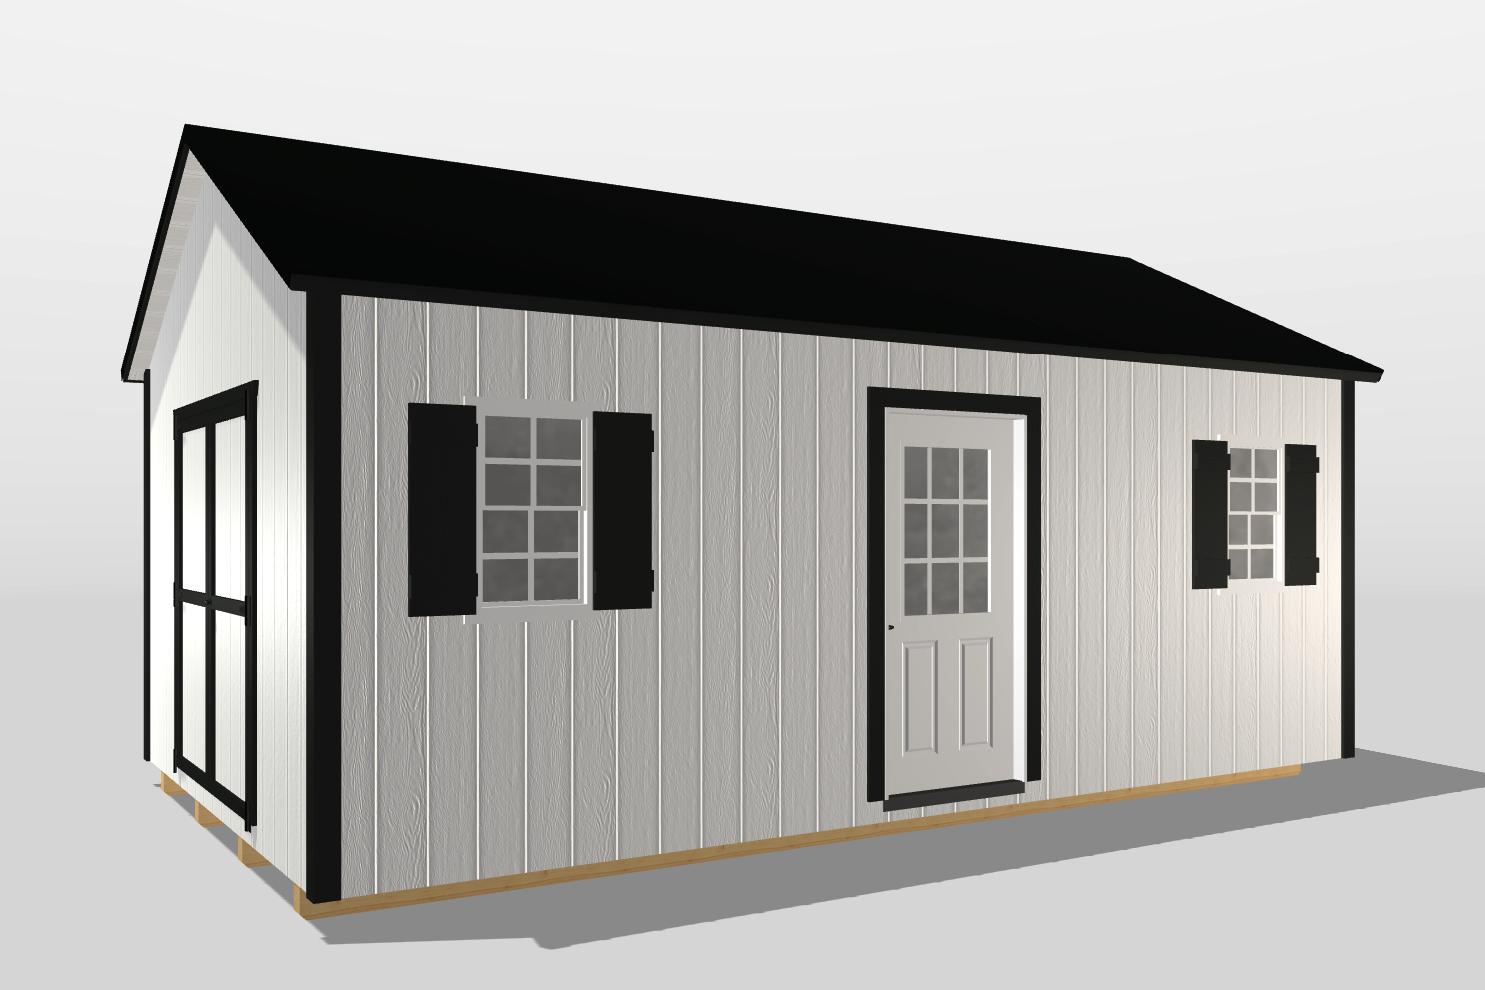 Storage shed design statesboro georgia